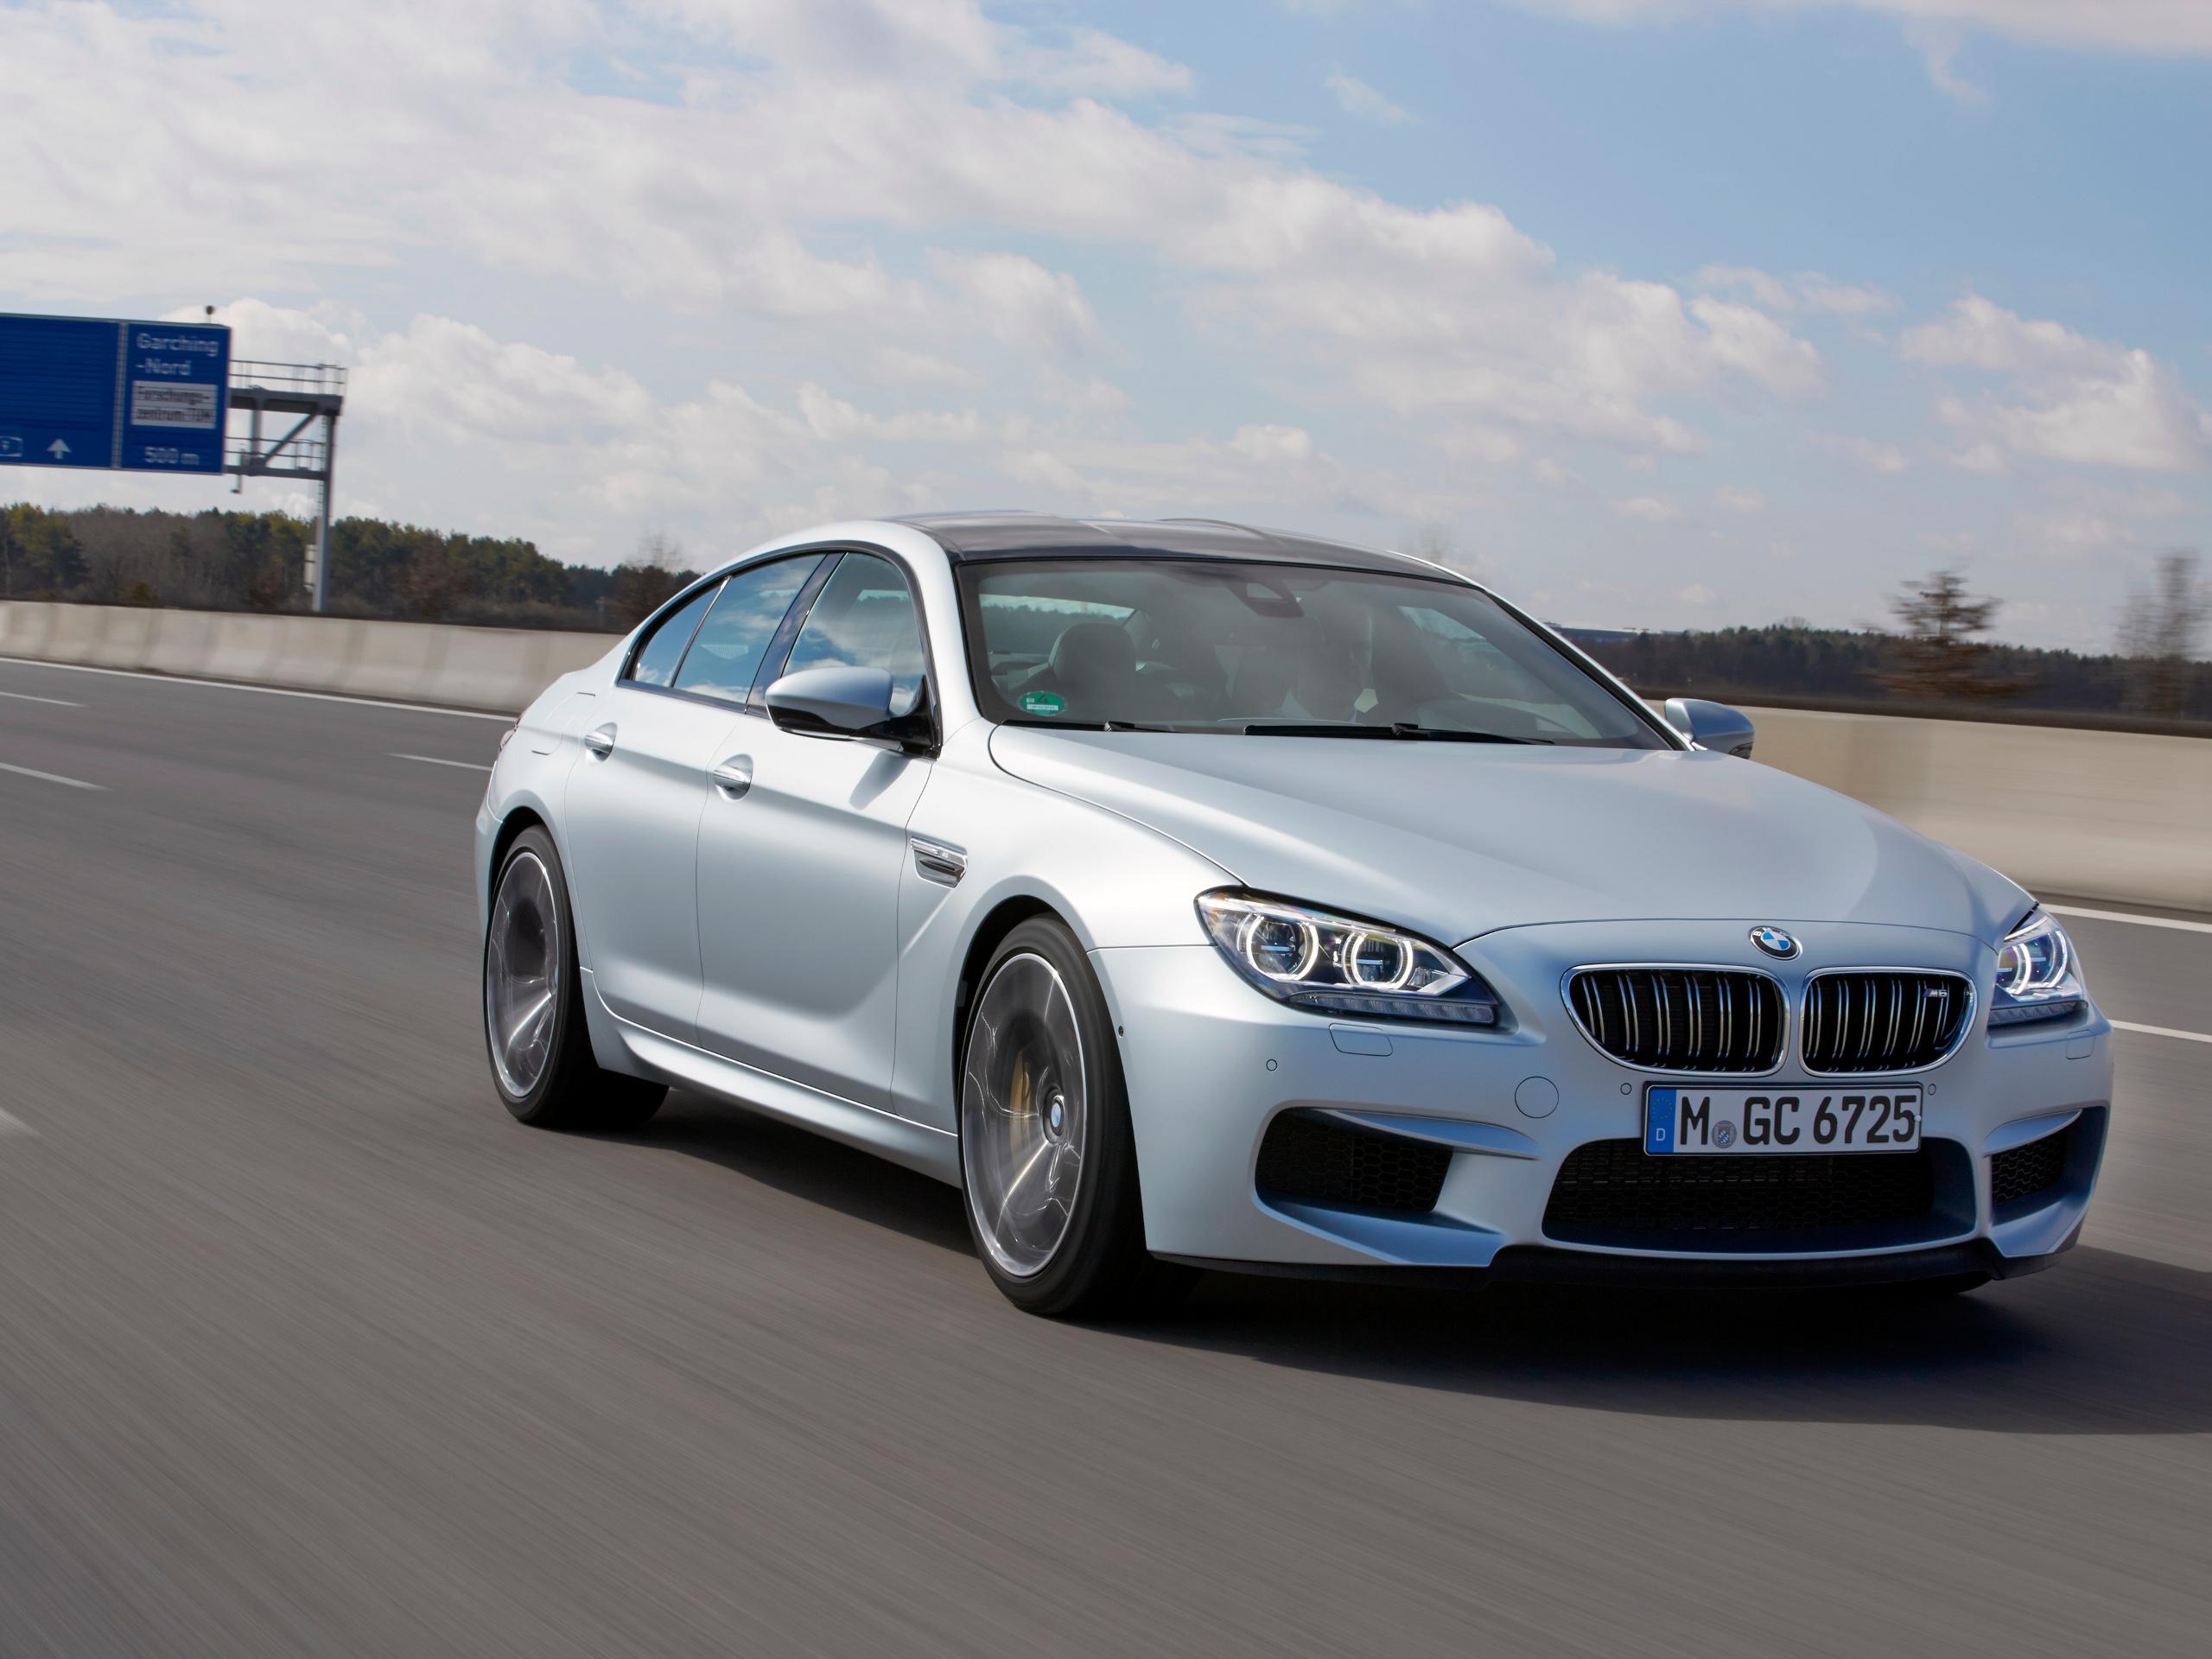 Fahrbericht BMW M6 Gran Coupé 2013 Bilder und technische Daten